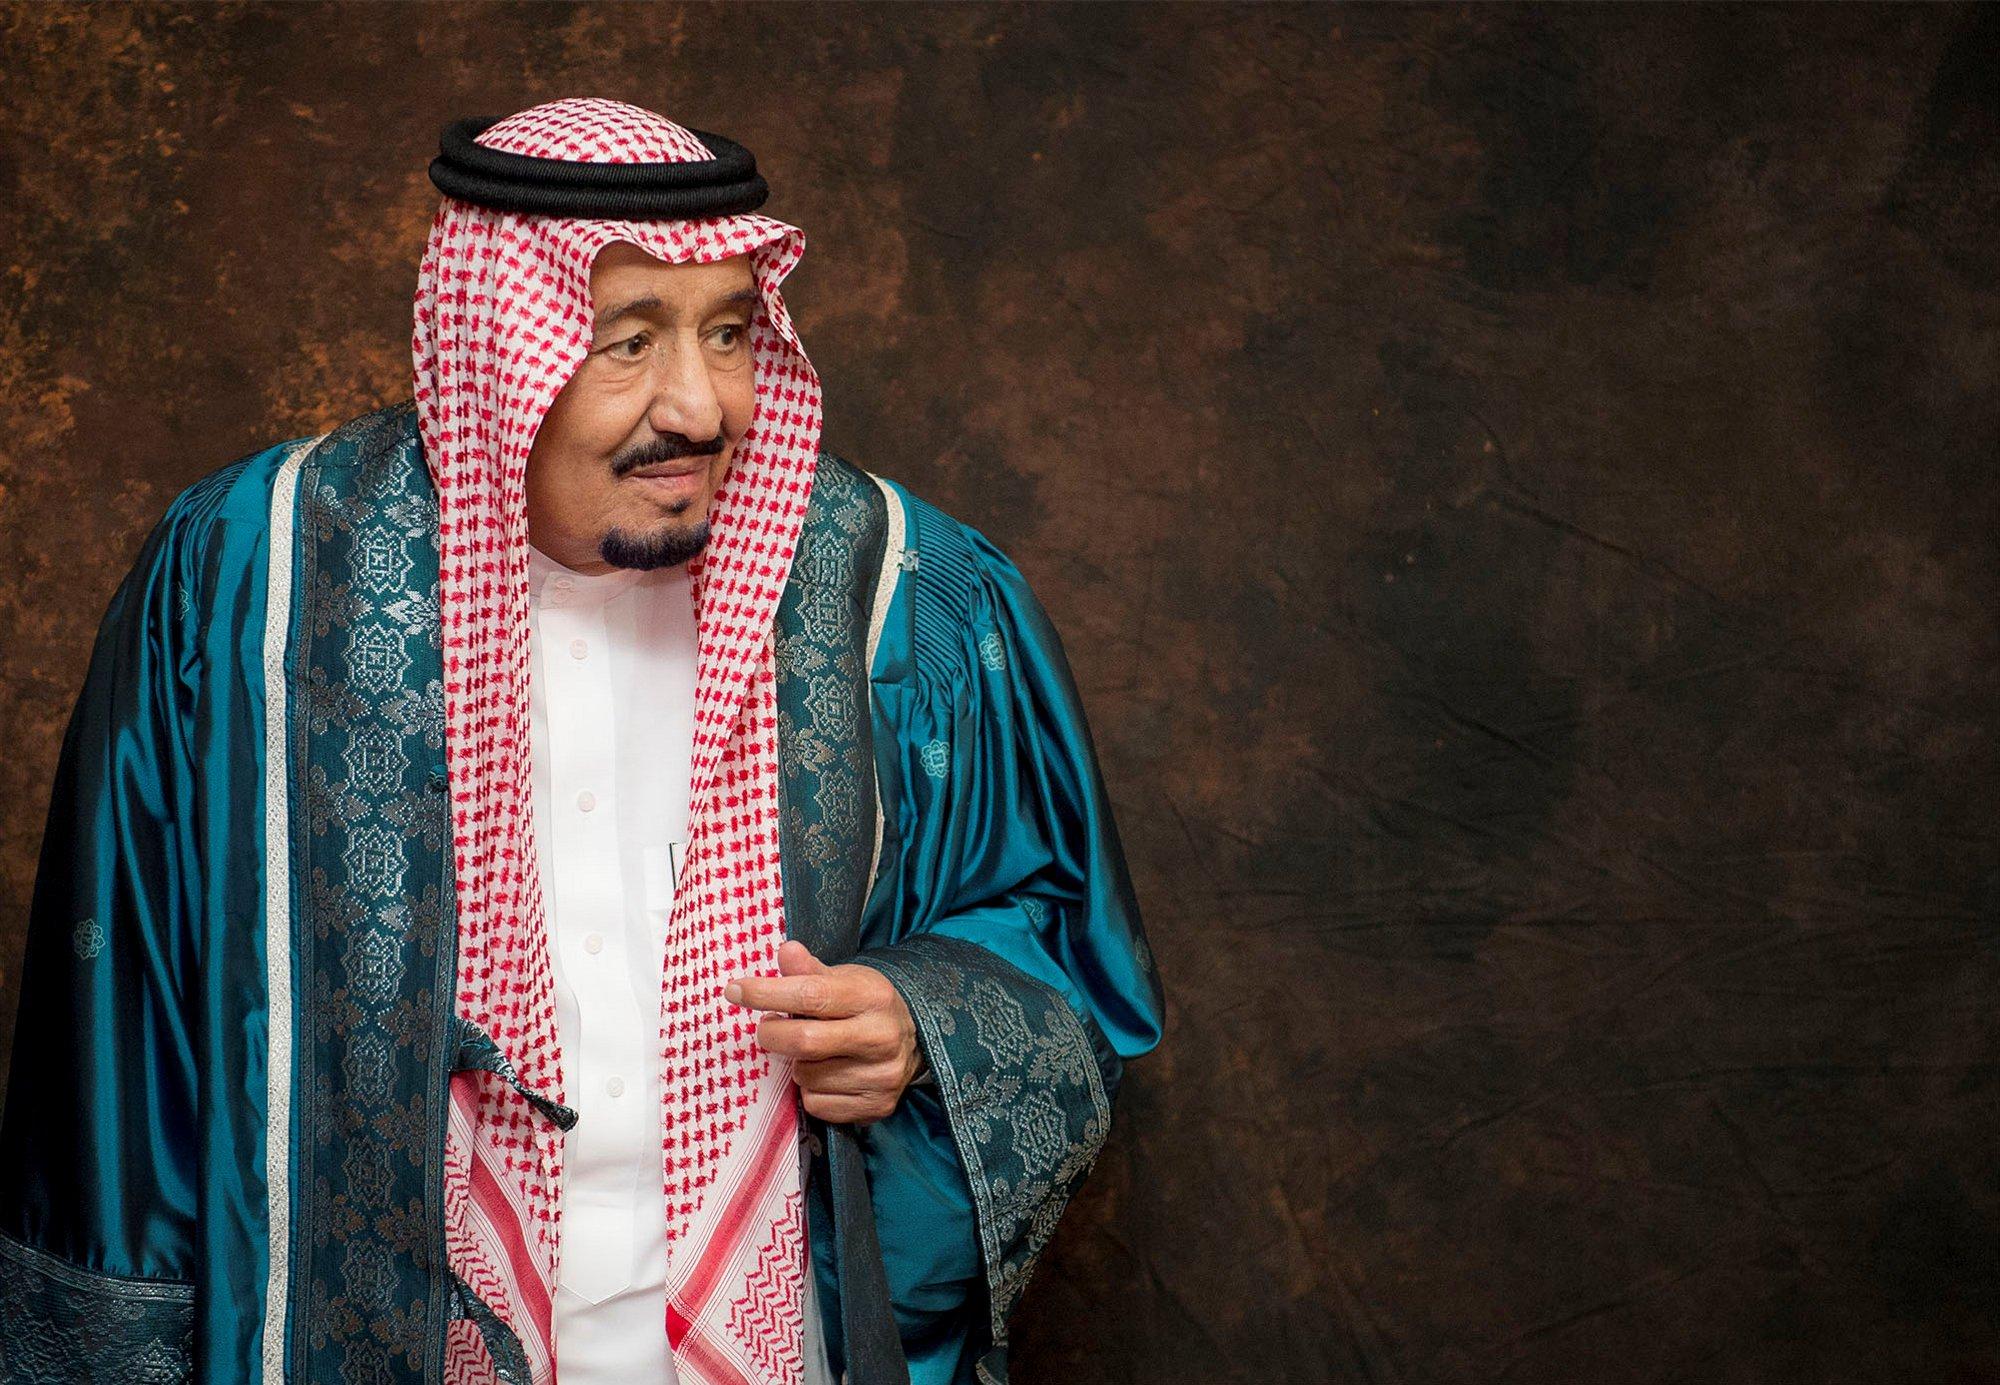 بالصور صور للملك سلمان , اروع الصور للملك سلمان 1124 10